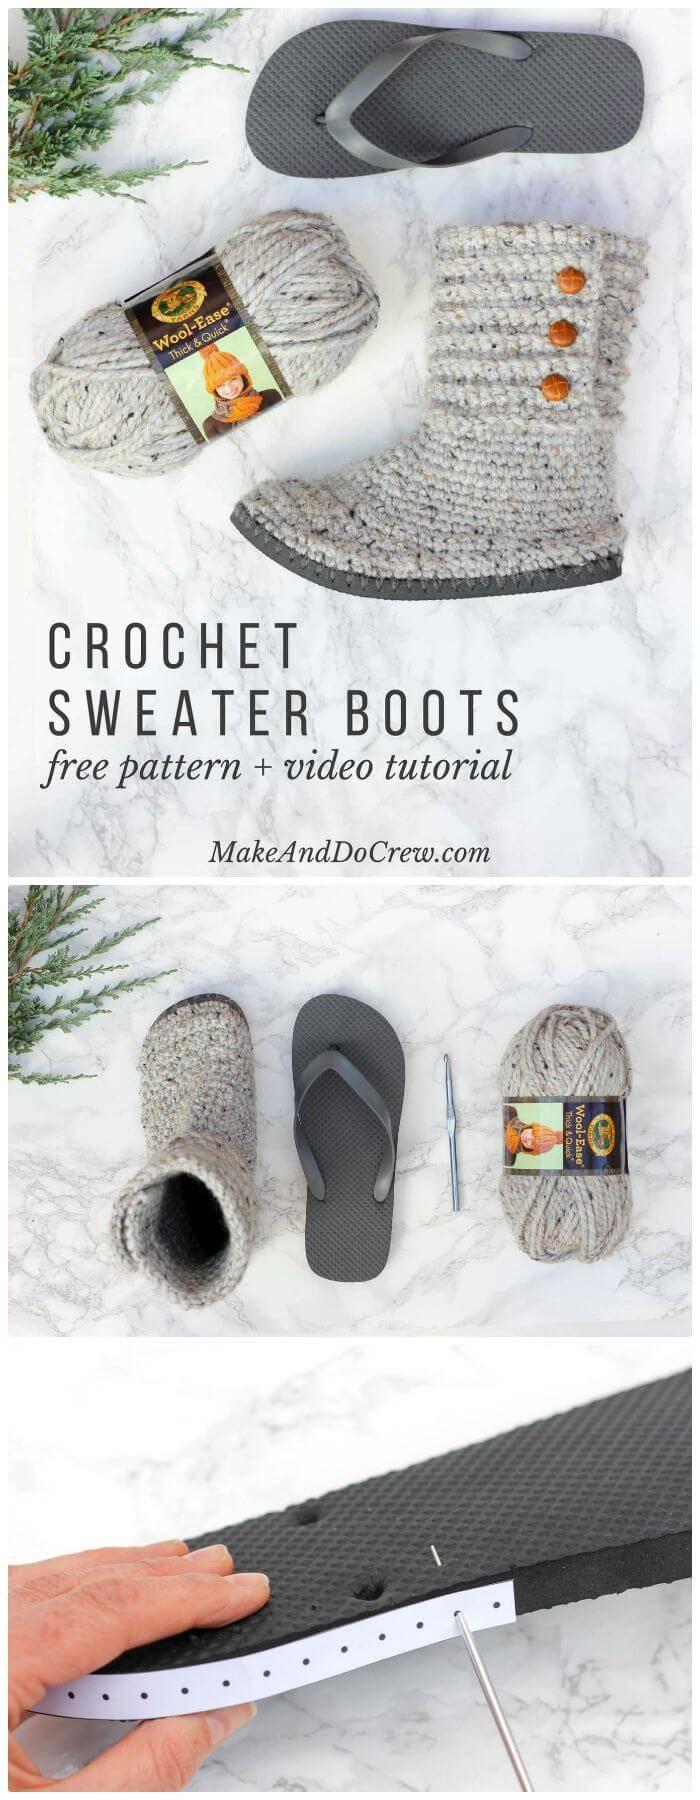 DIY Crochet Boots With Flip Flops - Free Pattern, flip flop boots crochet free pattern